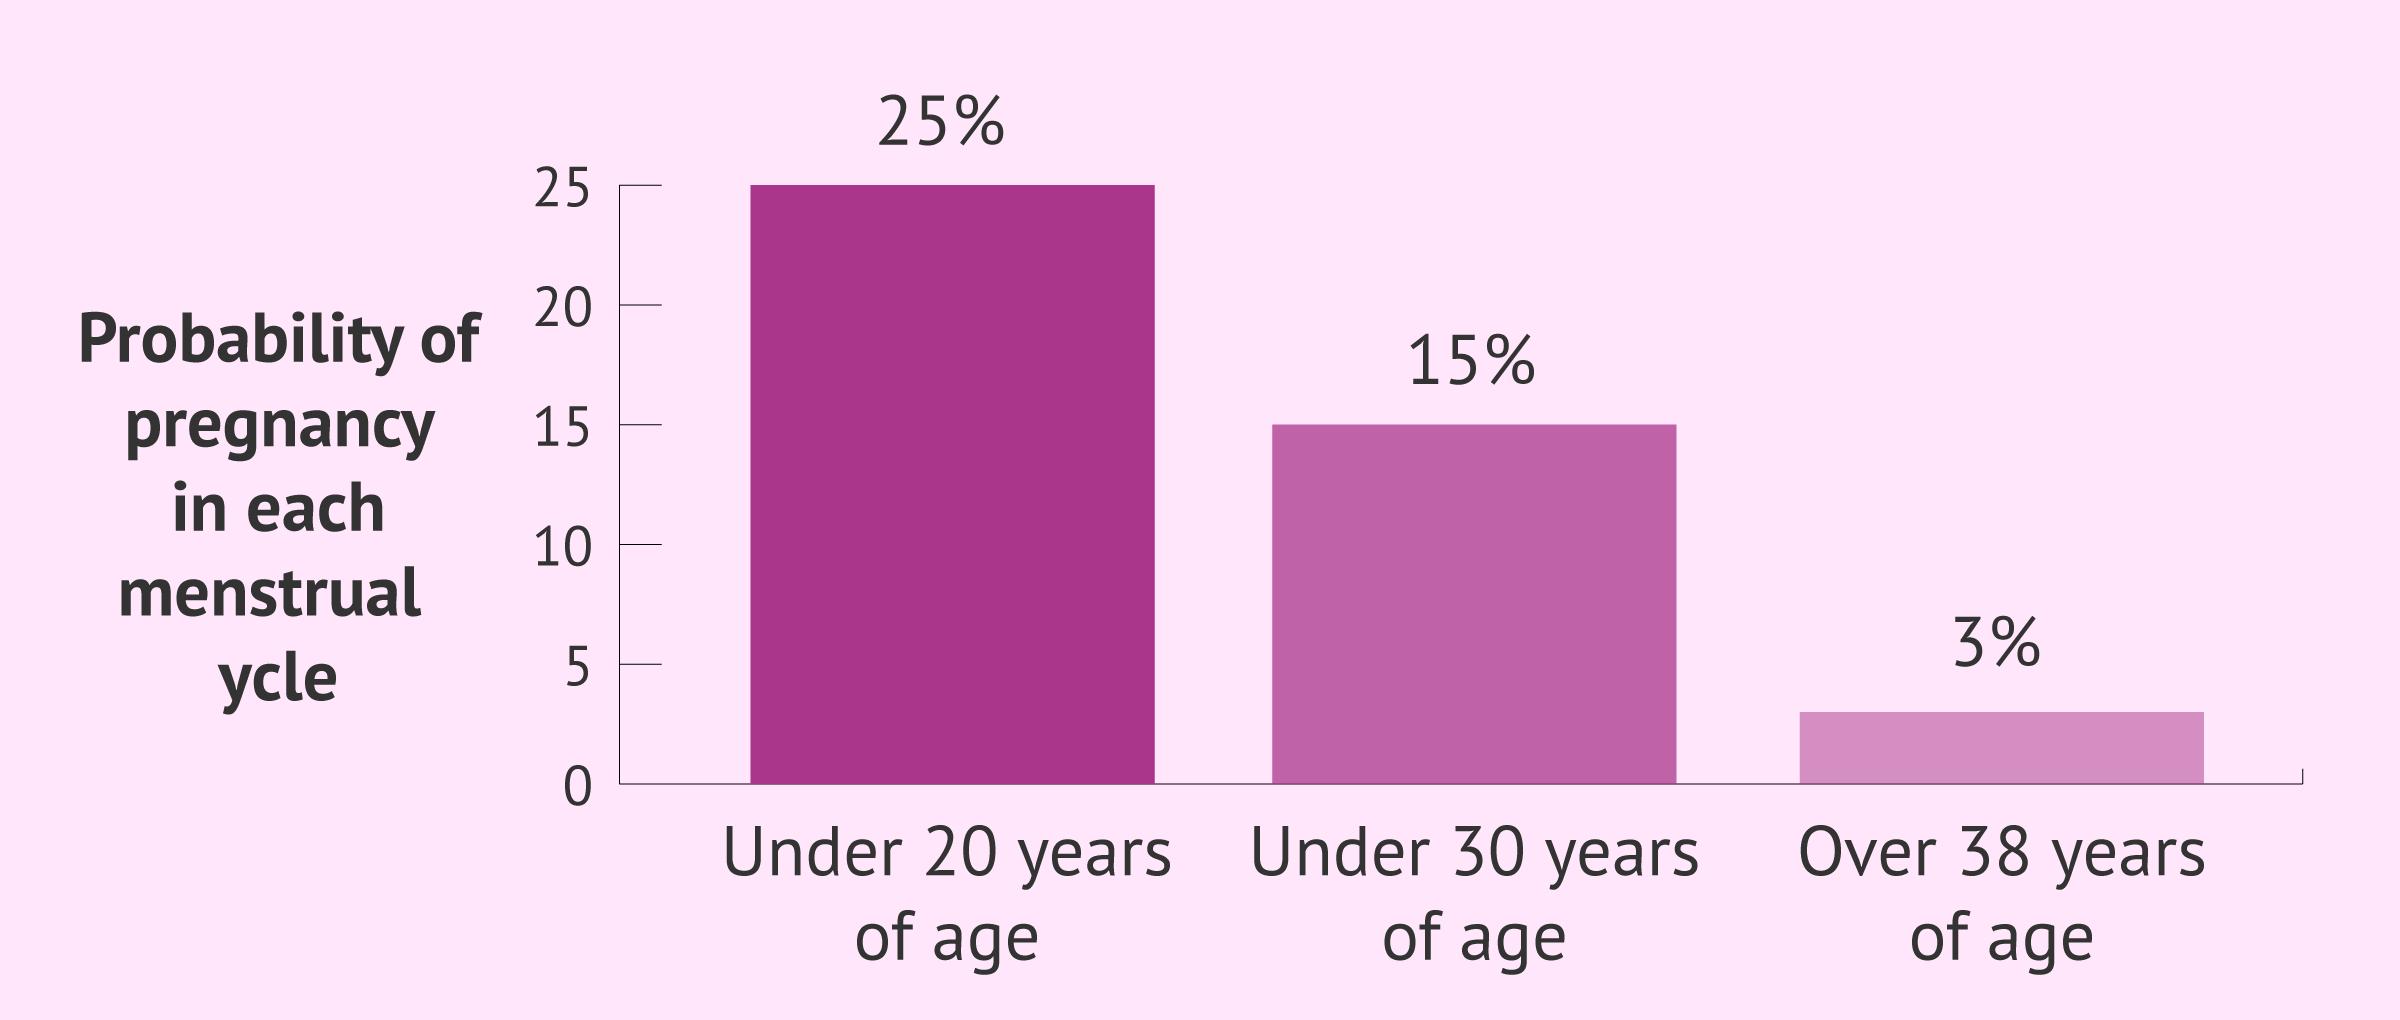 Pregnancy probability per menstrual cycle